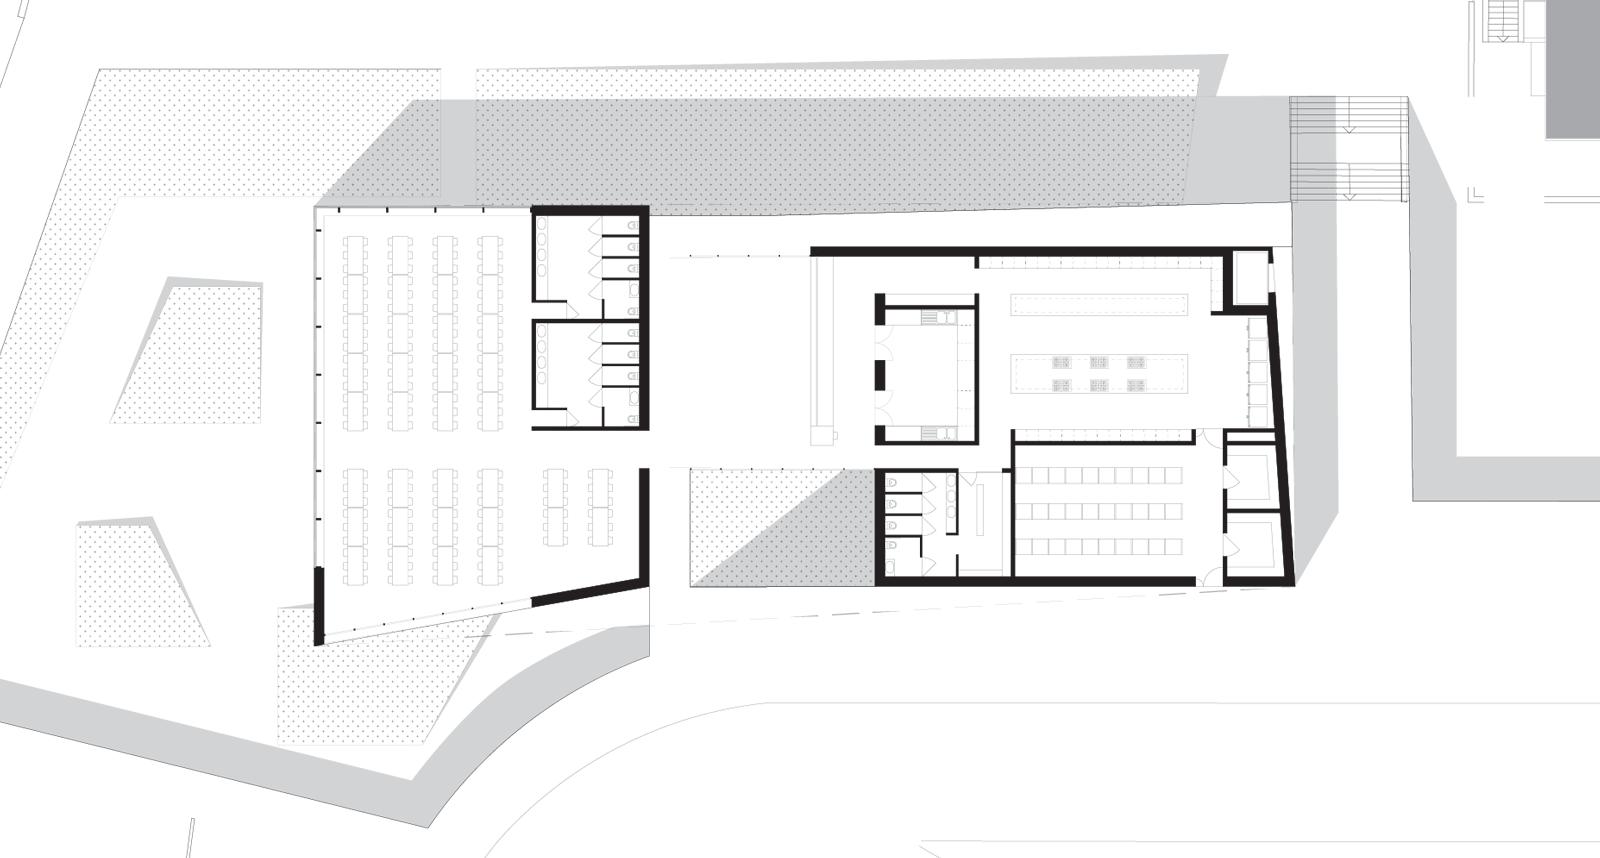 mensa-karl-wolf-merano-floor-plan